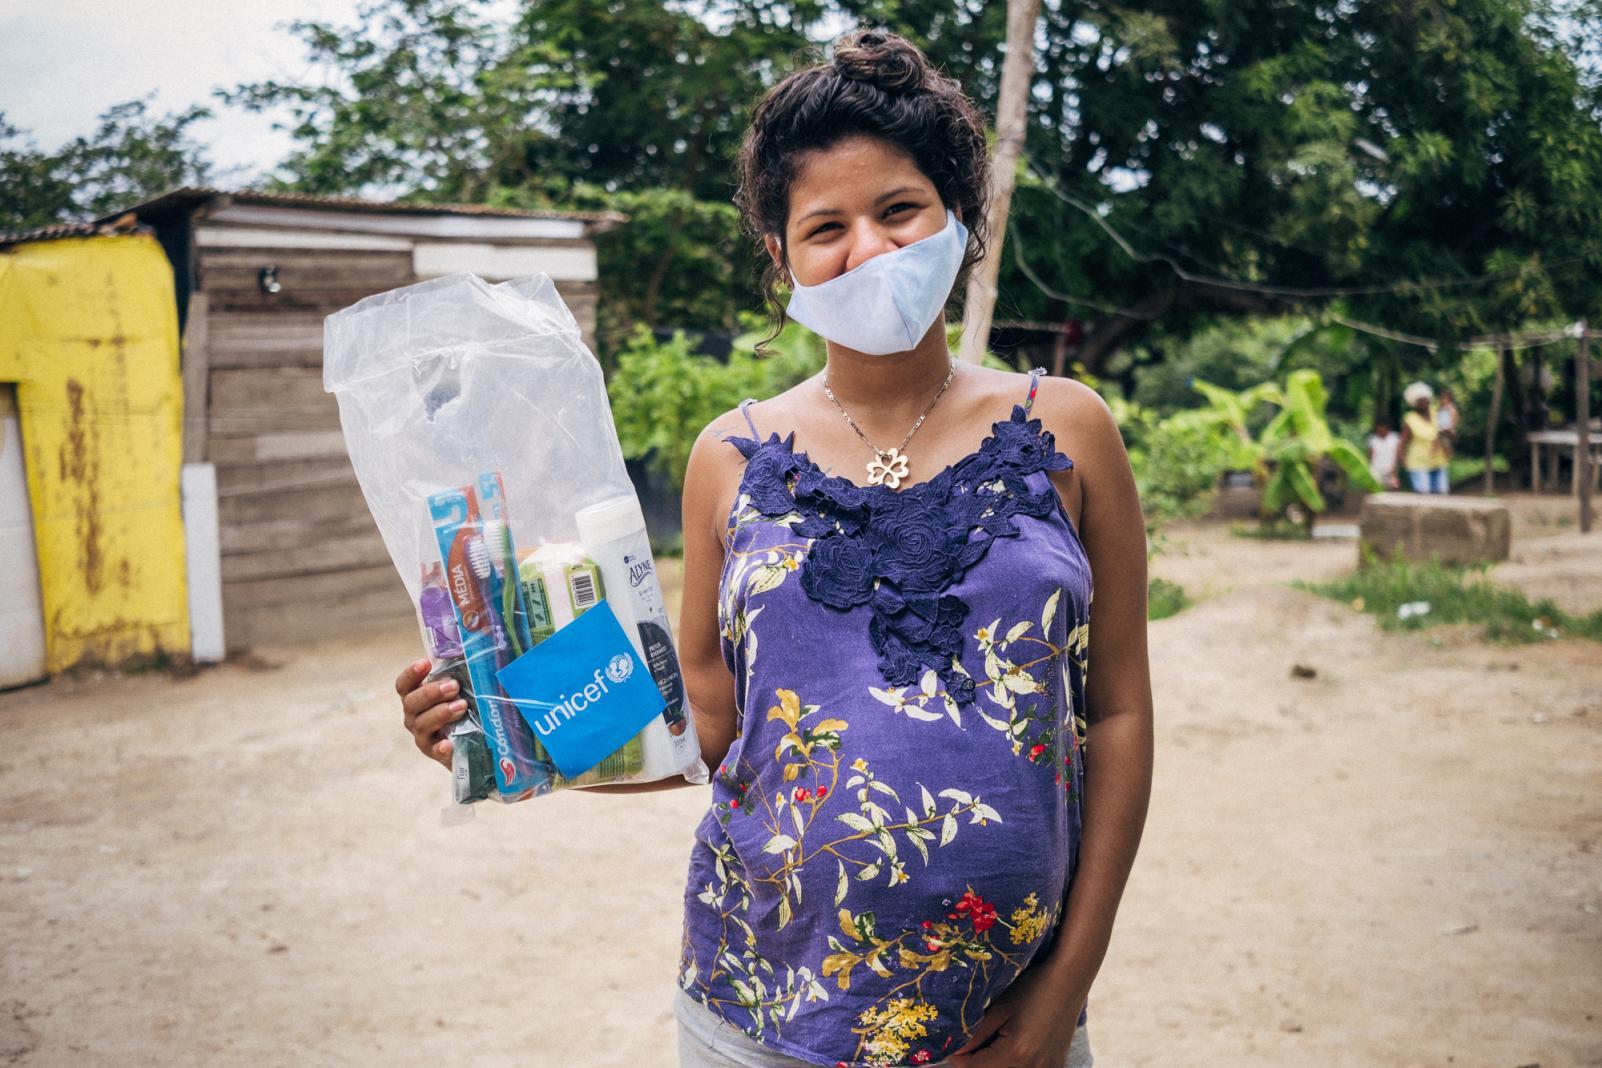 imigrantes-recebem-kits-da-unicef